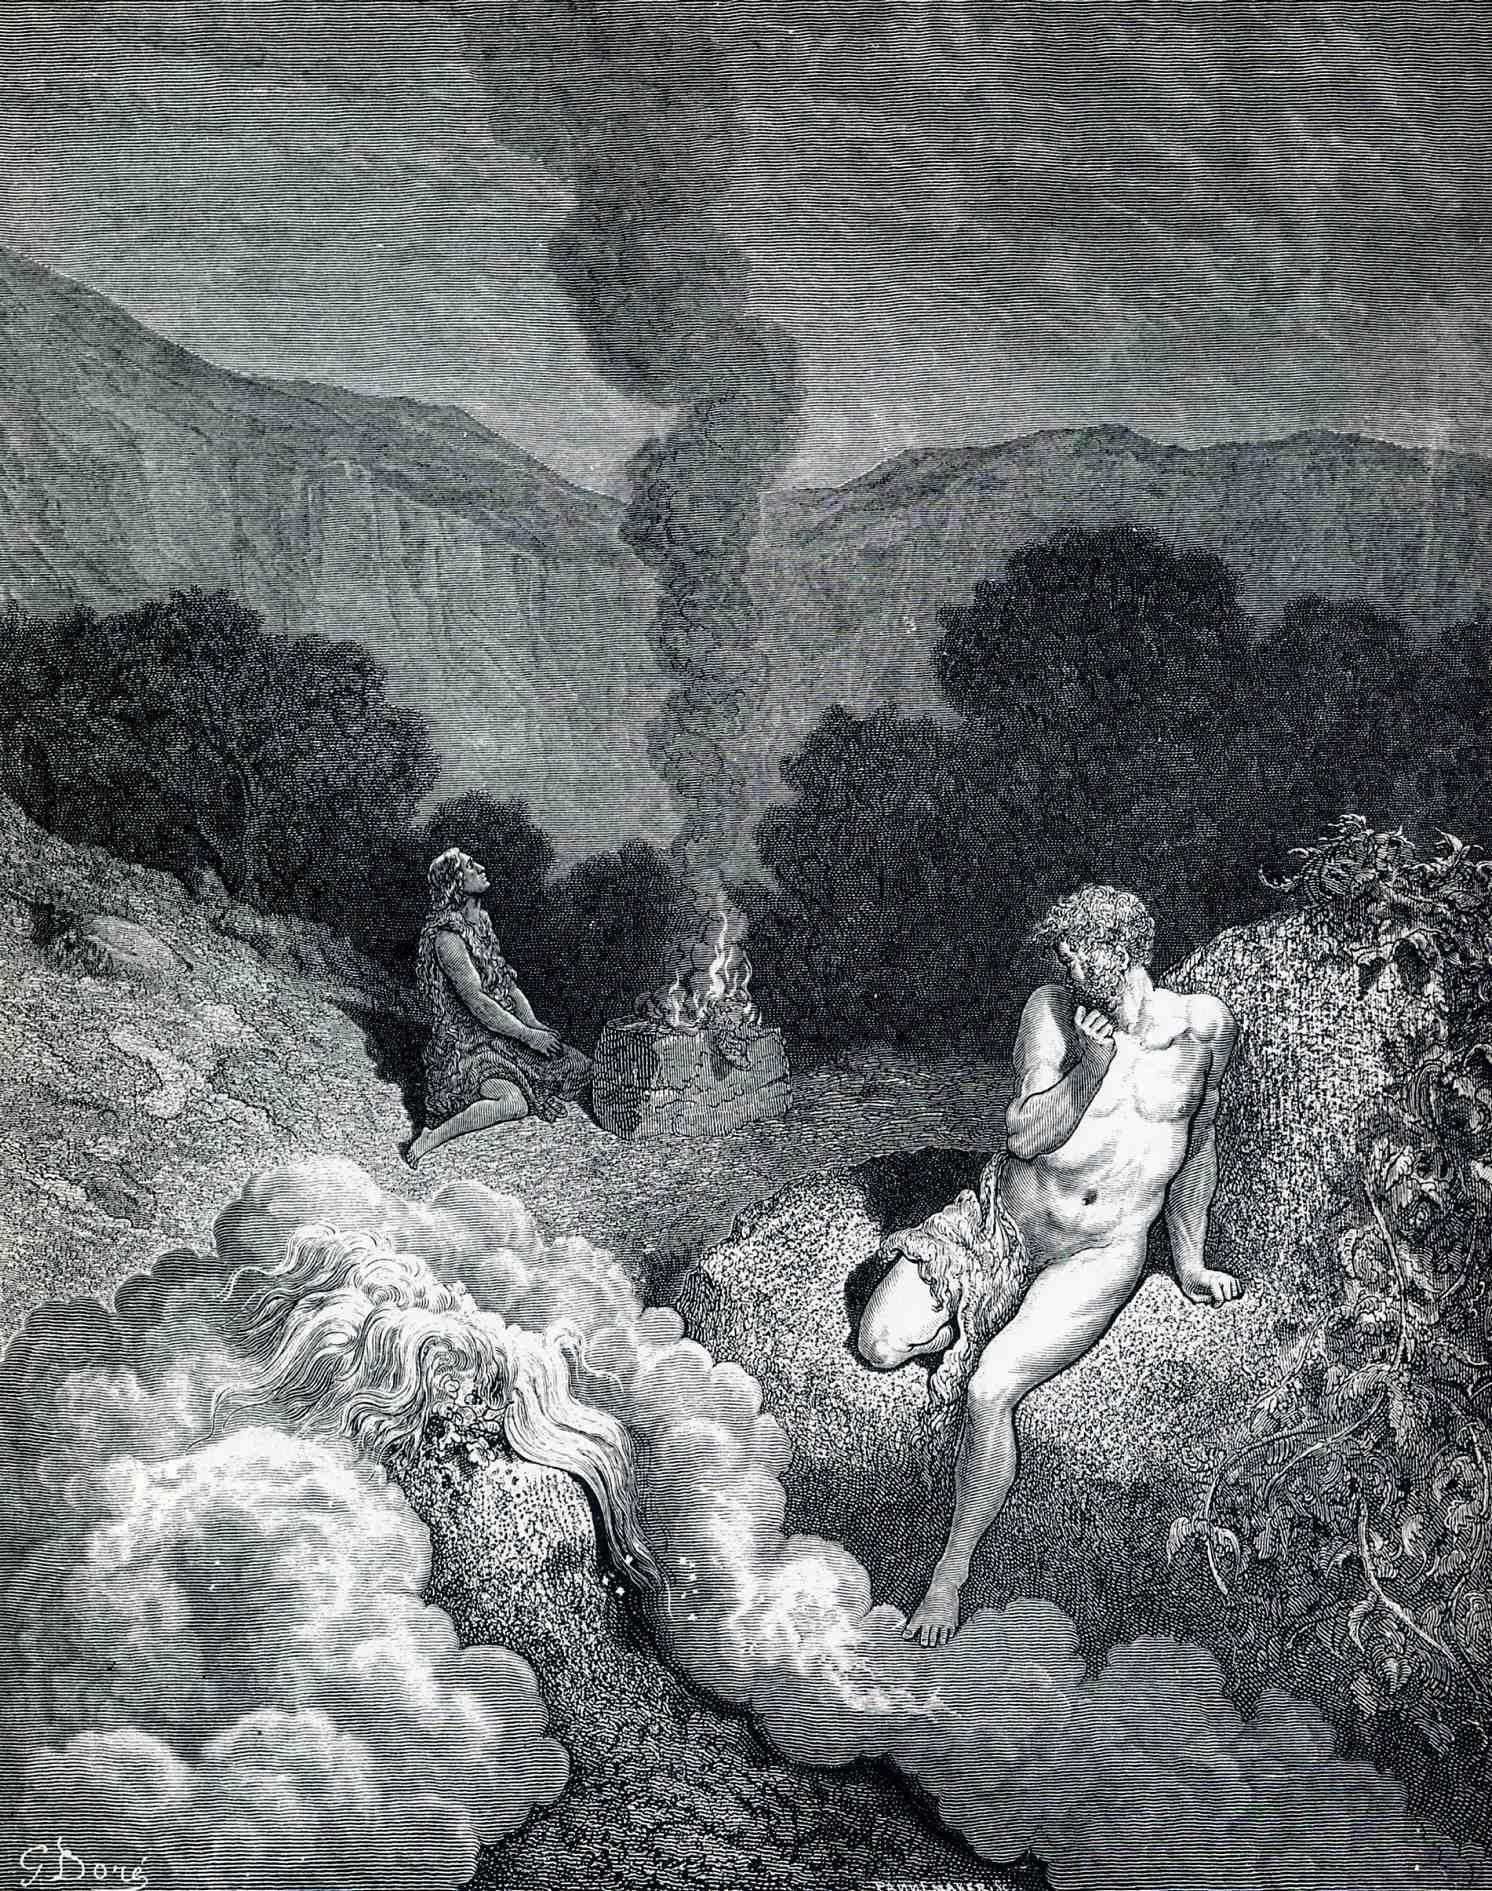 Картины, гравюры - Гюстав Доре / Pictures ...: nevsepic.com.ua/art-i-risovanaya-grafika/page,14,18664-kartiny...